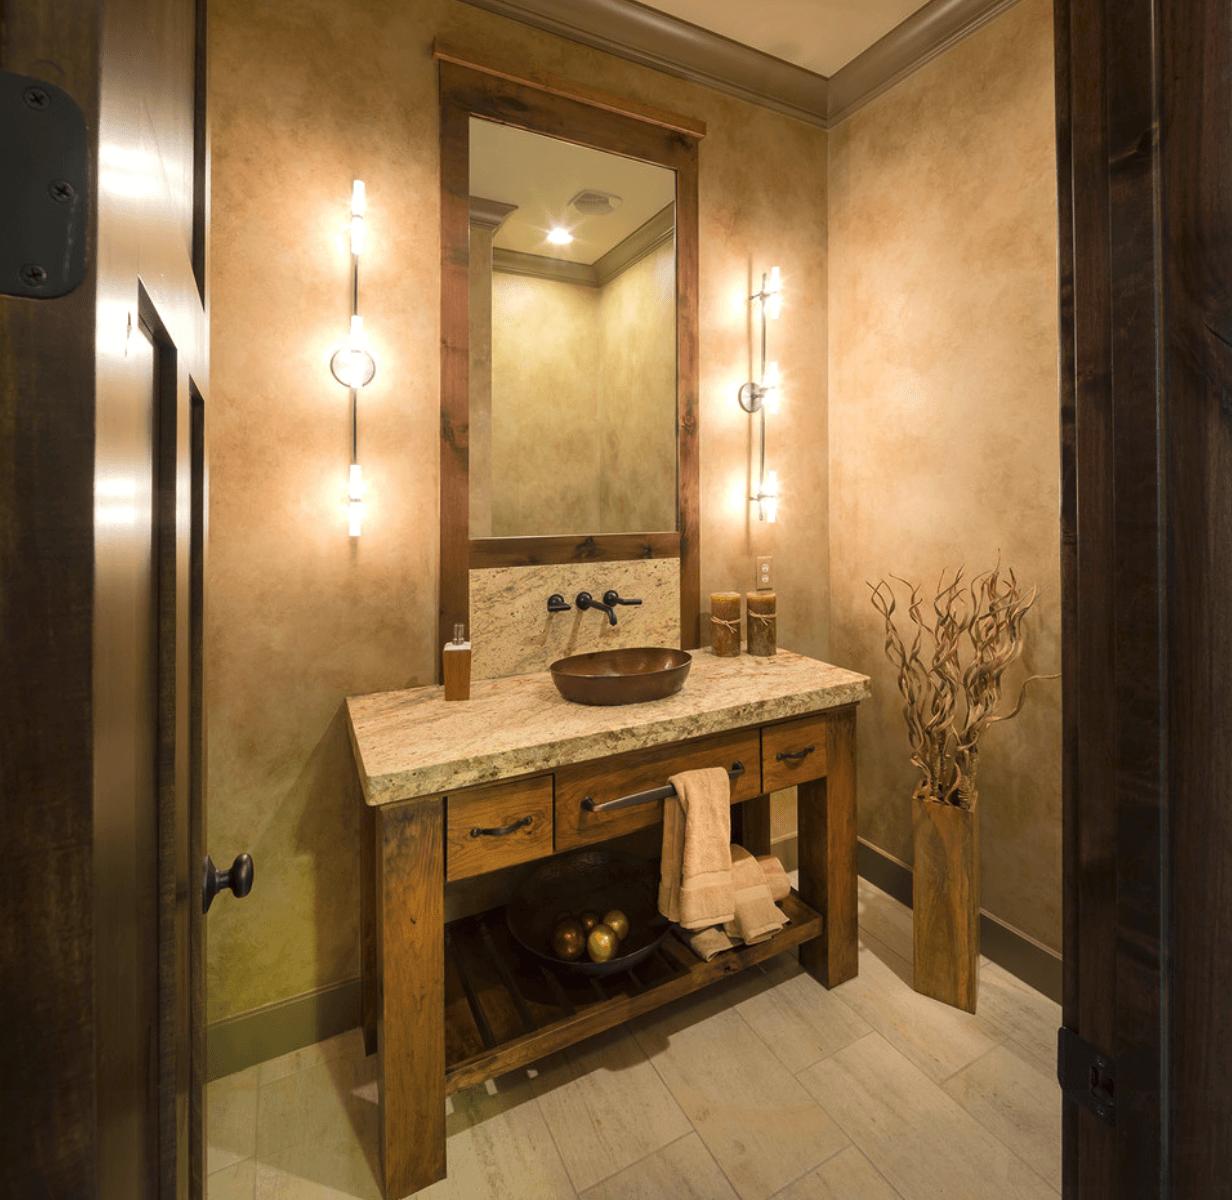 Banheiro Banheiro Moderno #B37A18 1232x1200 Balcao Banheiro Moderno